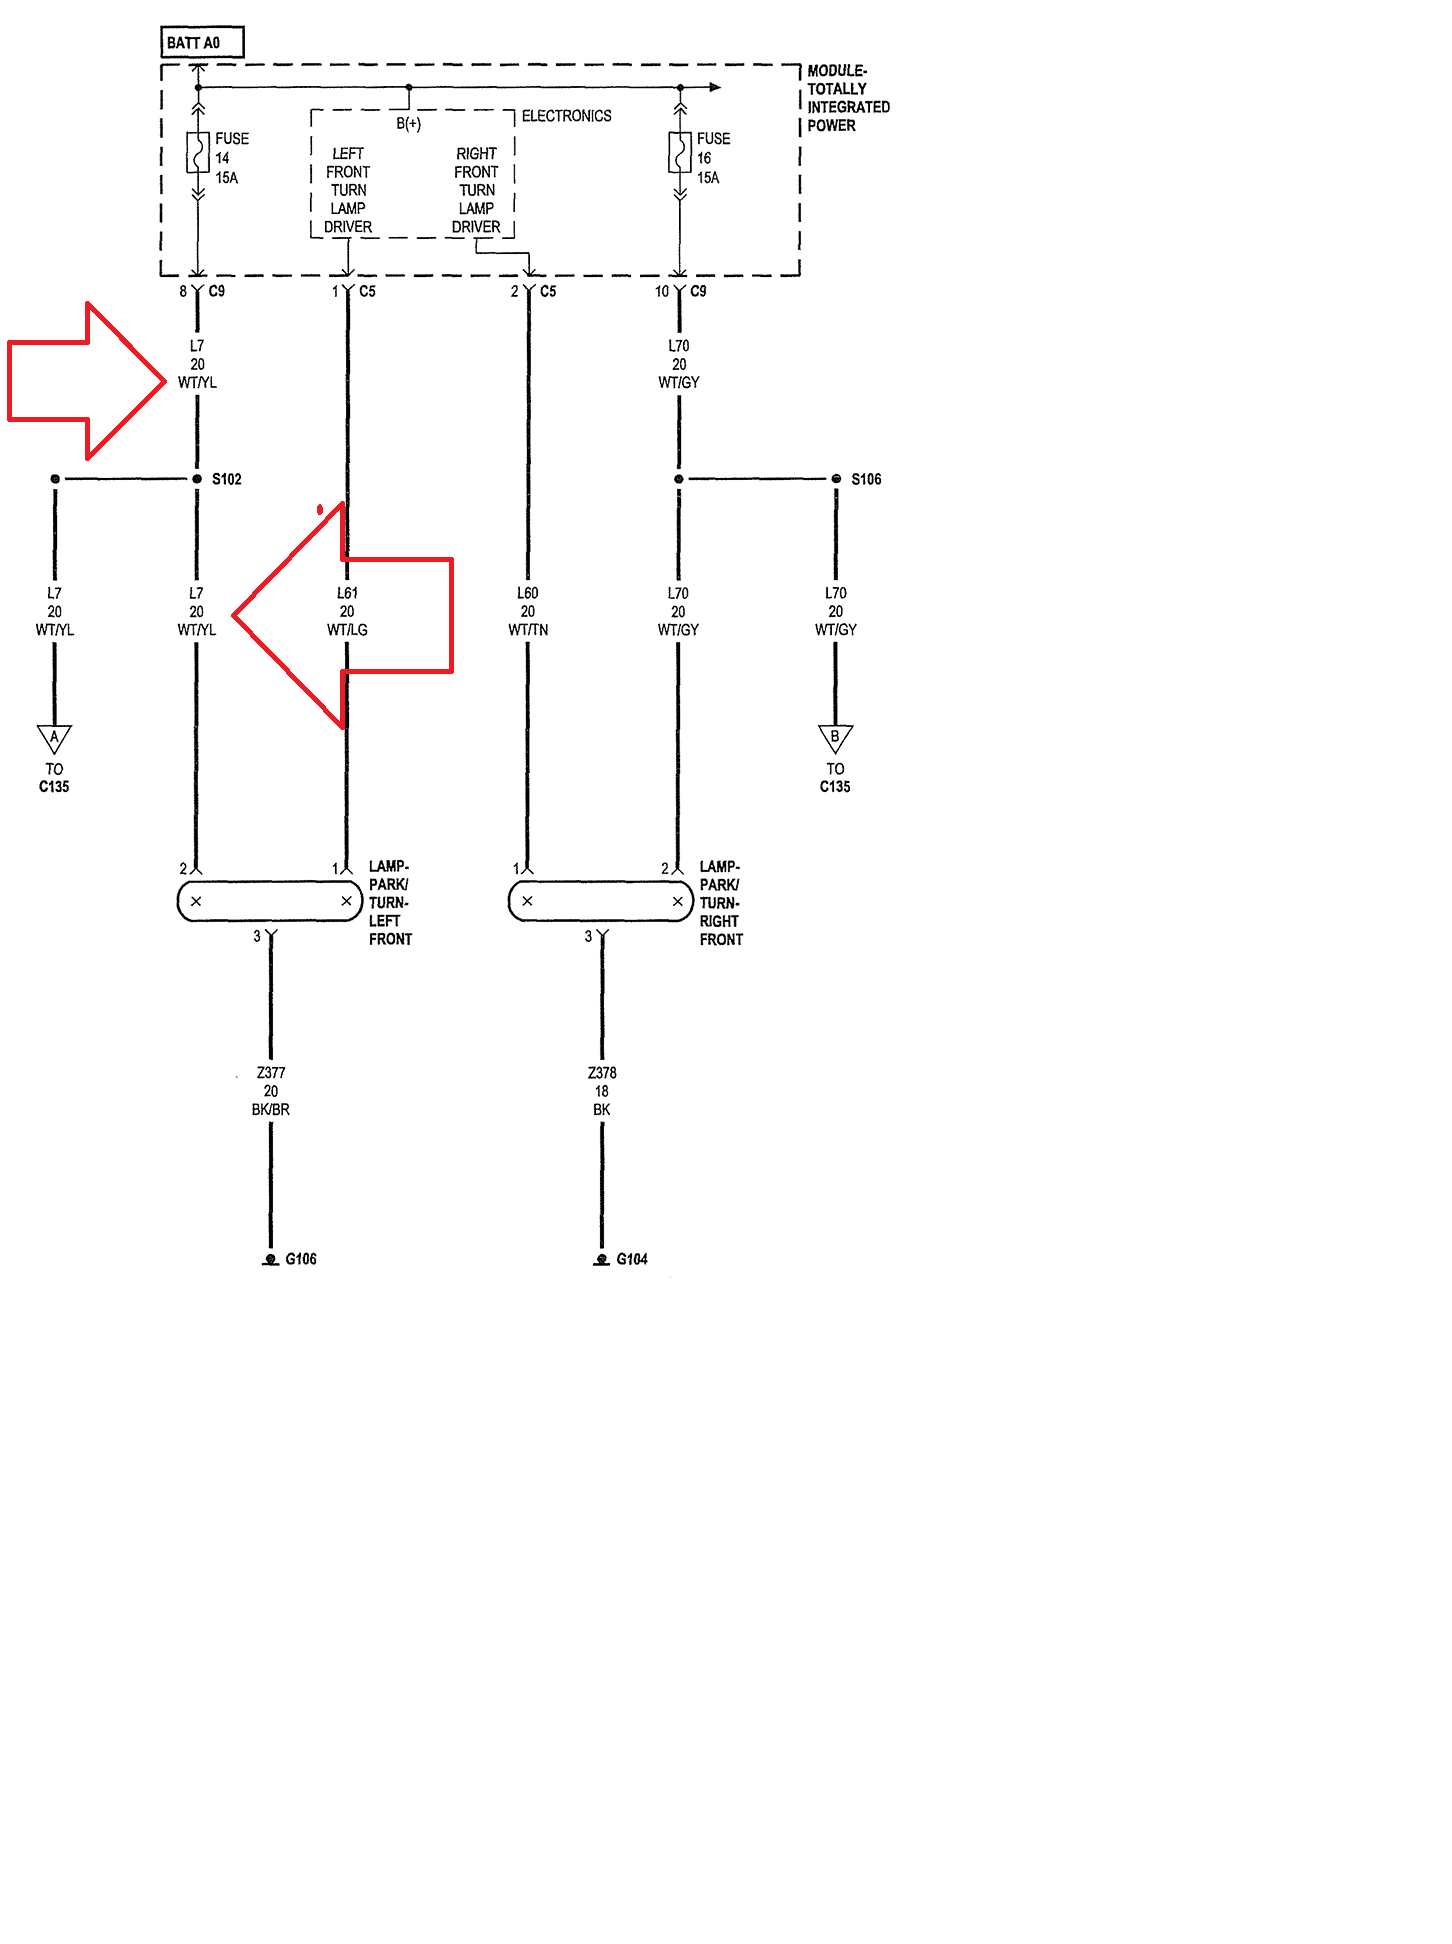 [DIAGRAM_3ER]  CV_8725] Dodge Ram Power Mirror Wiring Diagram Wiring Diagram | Challenger Side Mirror Wiring Diagram |  | Etic Lectr Frag Osuri Iosco Anth Exxlu Wedab Vell Waro Hendil  Mohammedshrine Librar Wiring 101